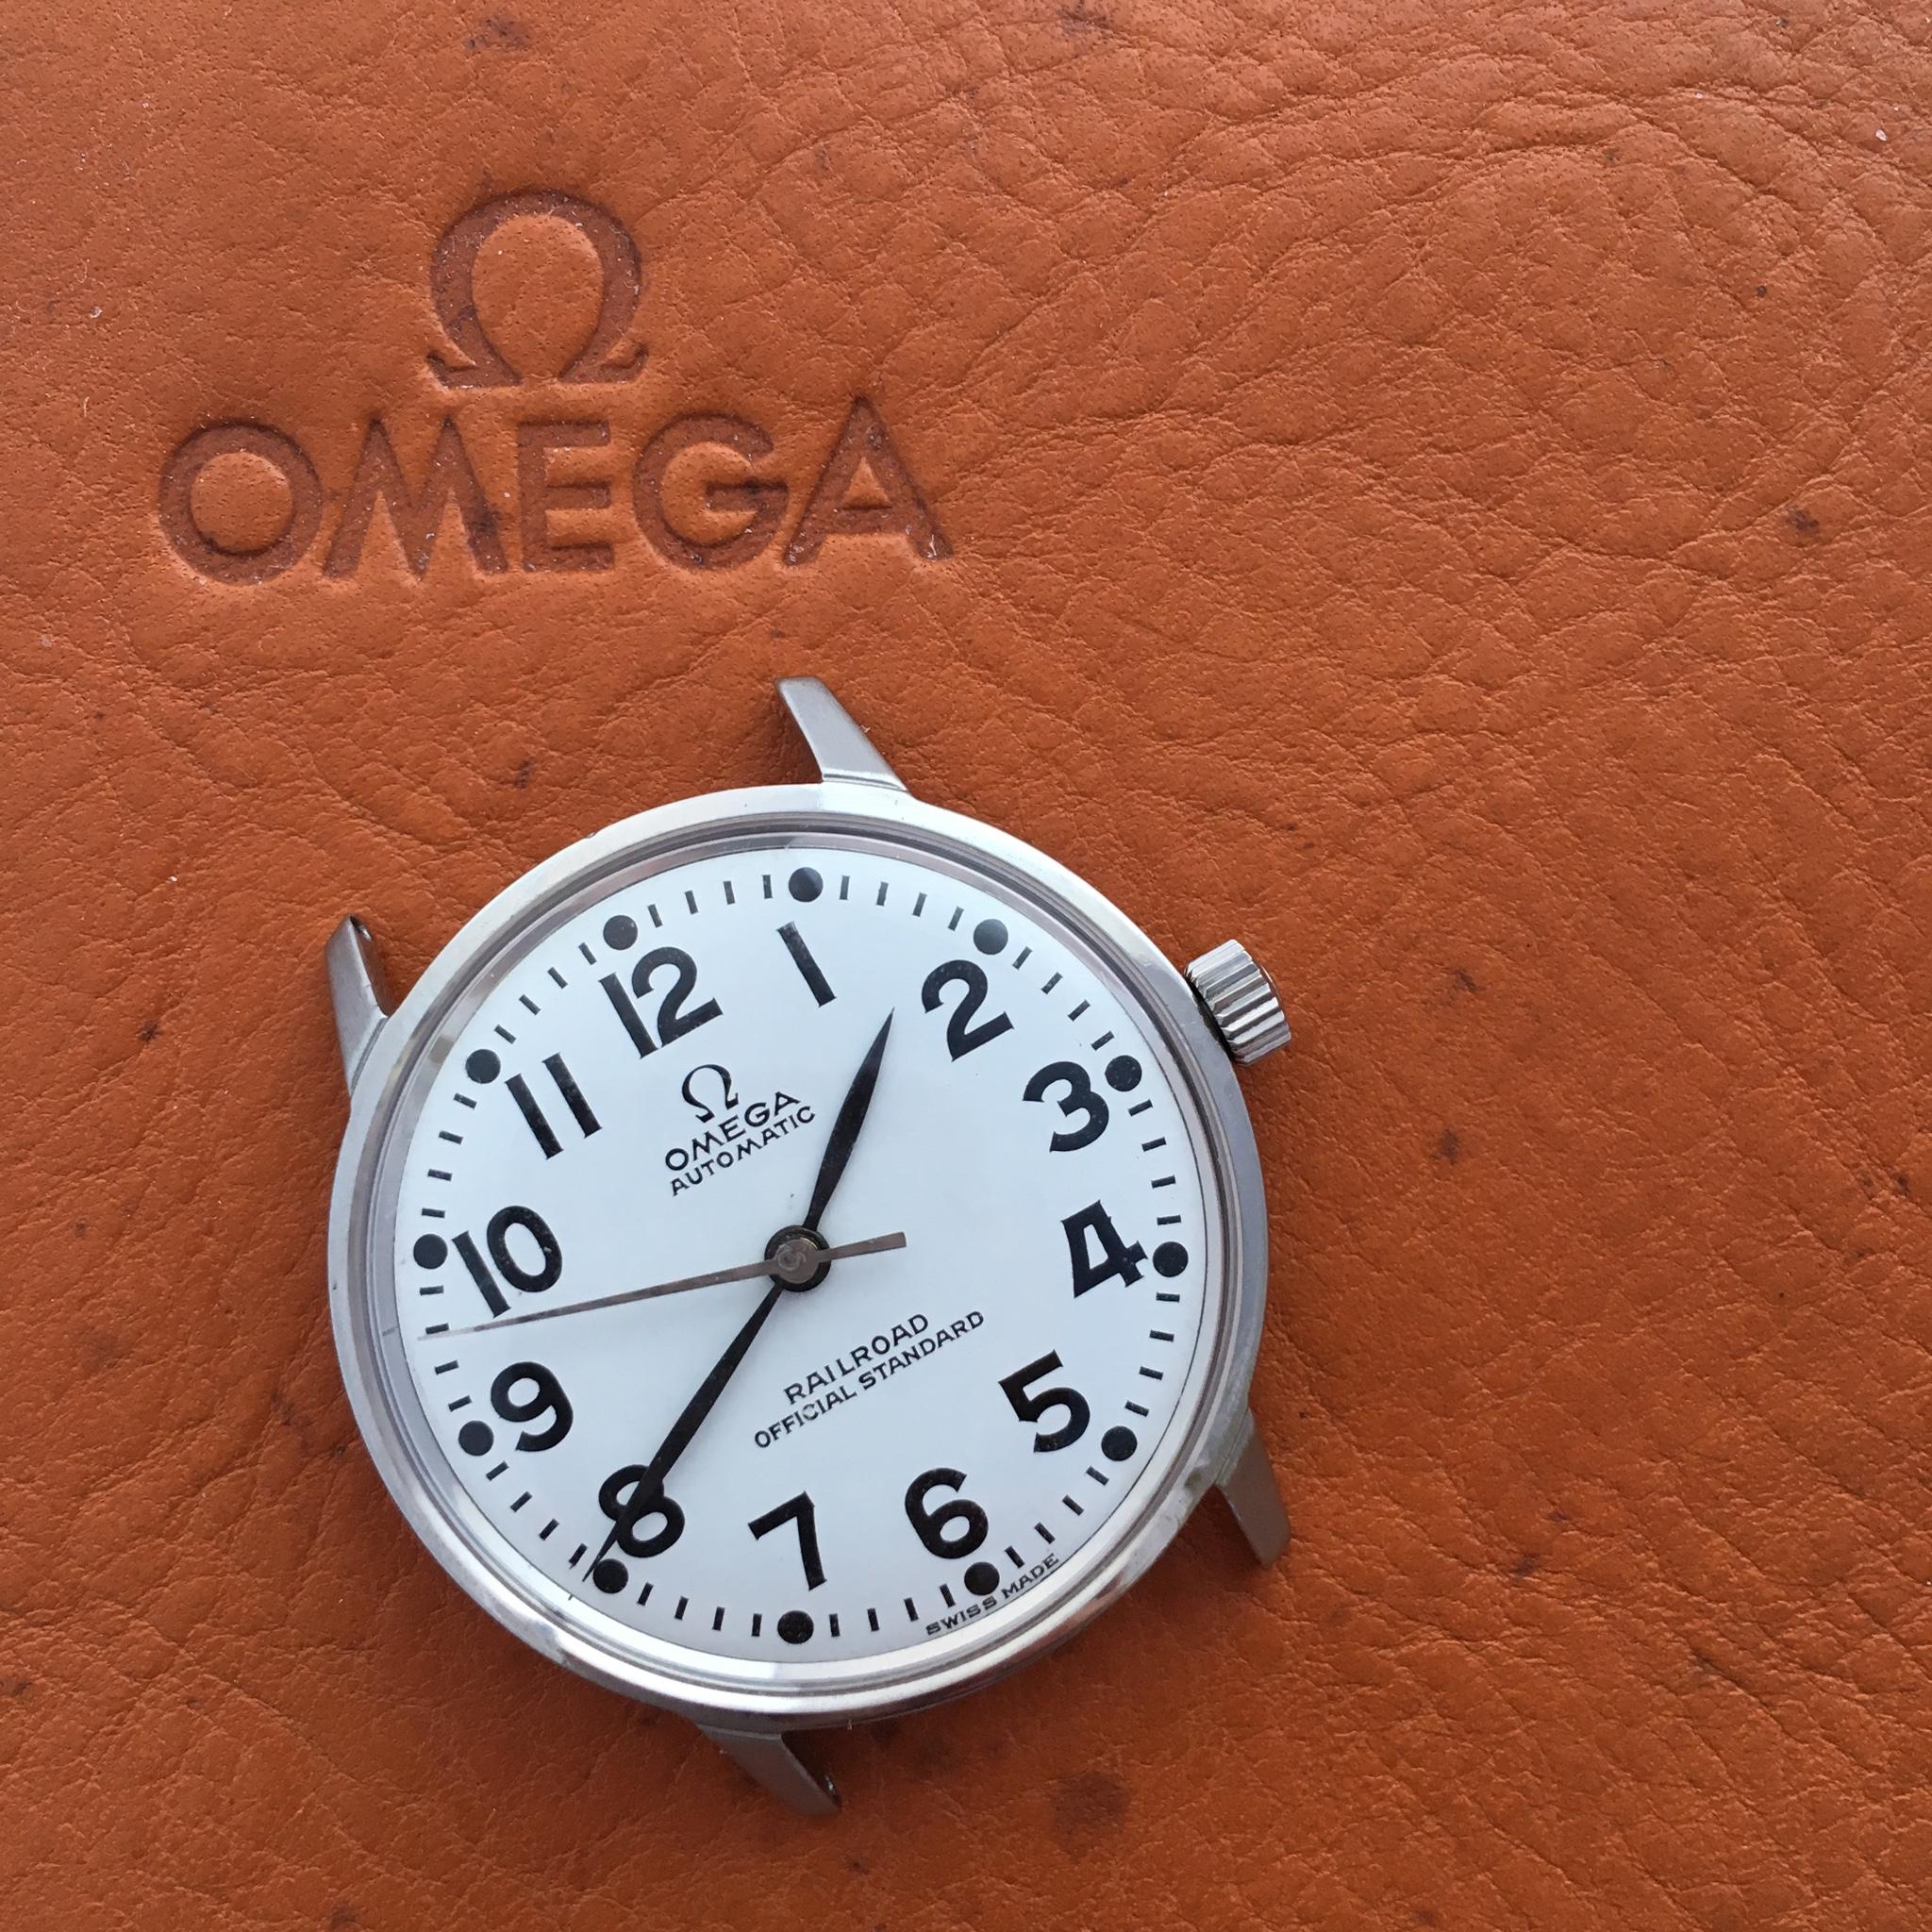 Omega Railmaster Railroad Official Standard Edition. Photo courtesy of theimitator, Watchuseek user.